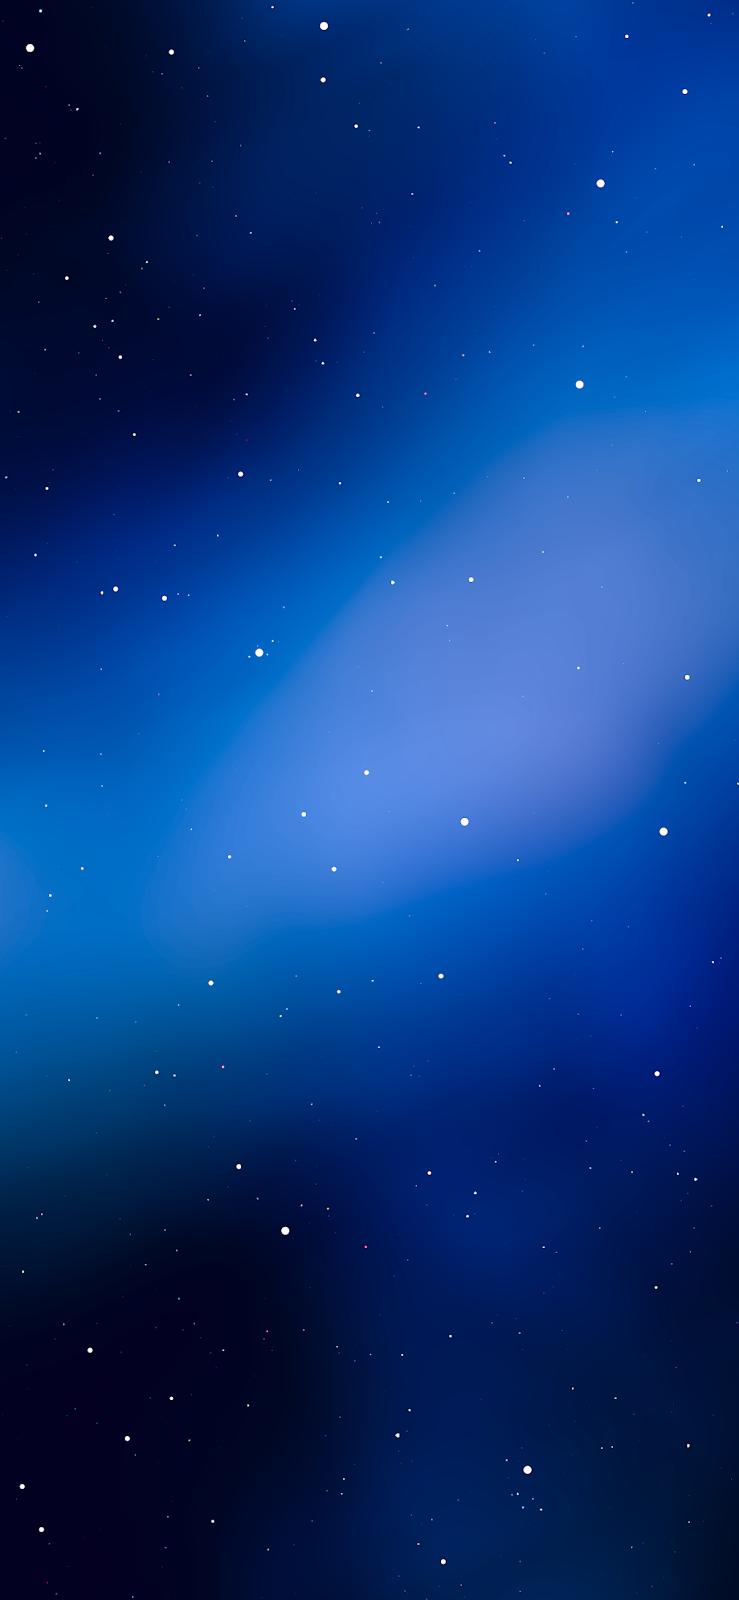 Dark Night Wallpaper Iphone Android Background Followme Dark Blue Wallpaper Galaxy Phone Wallpaper Dark Wallpaper Iphone